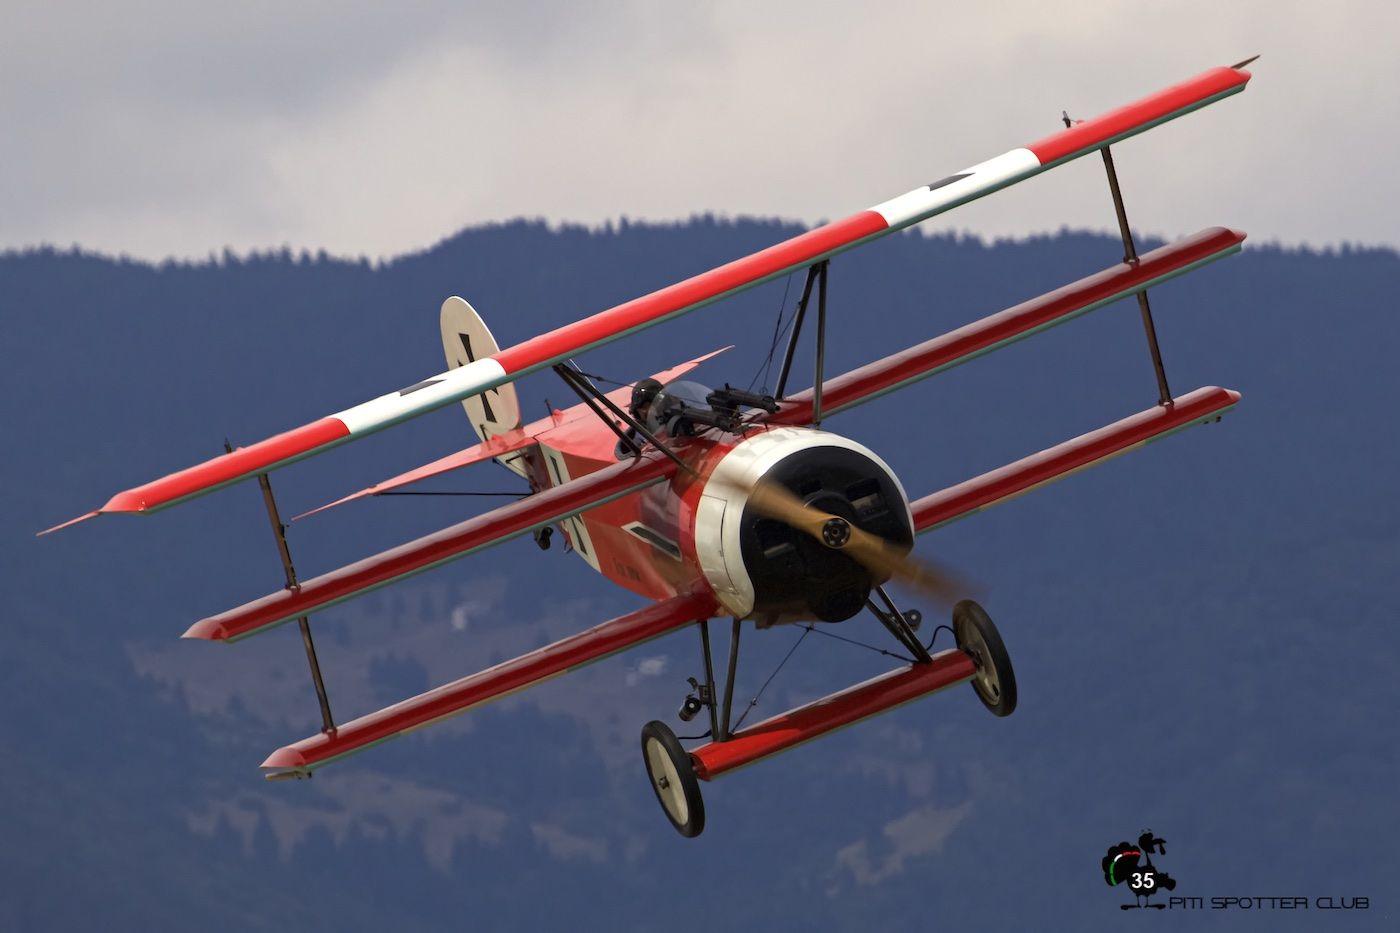 FlighThiene 2015 - Thiene 26.07.2015 - SPOTTING AEROPORTI ITALIA